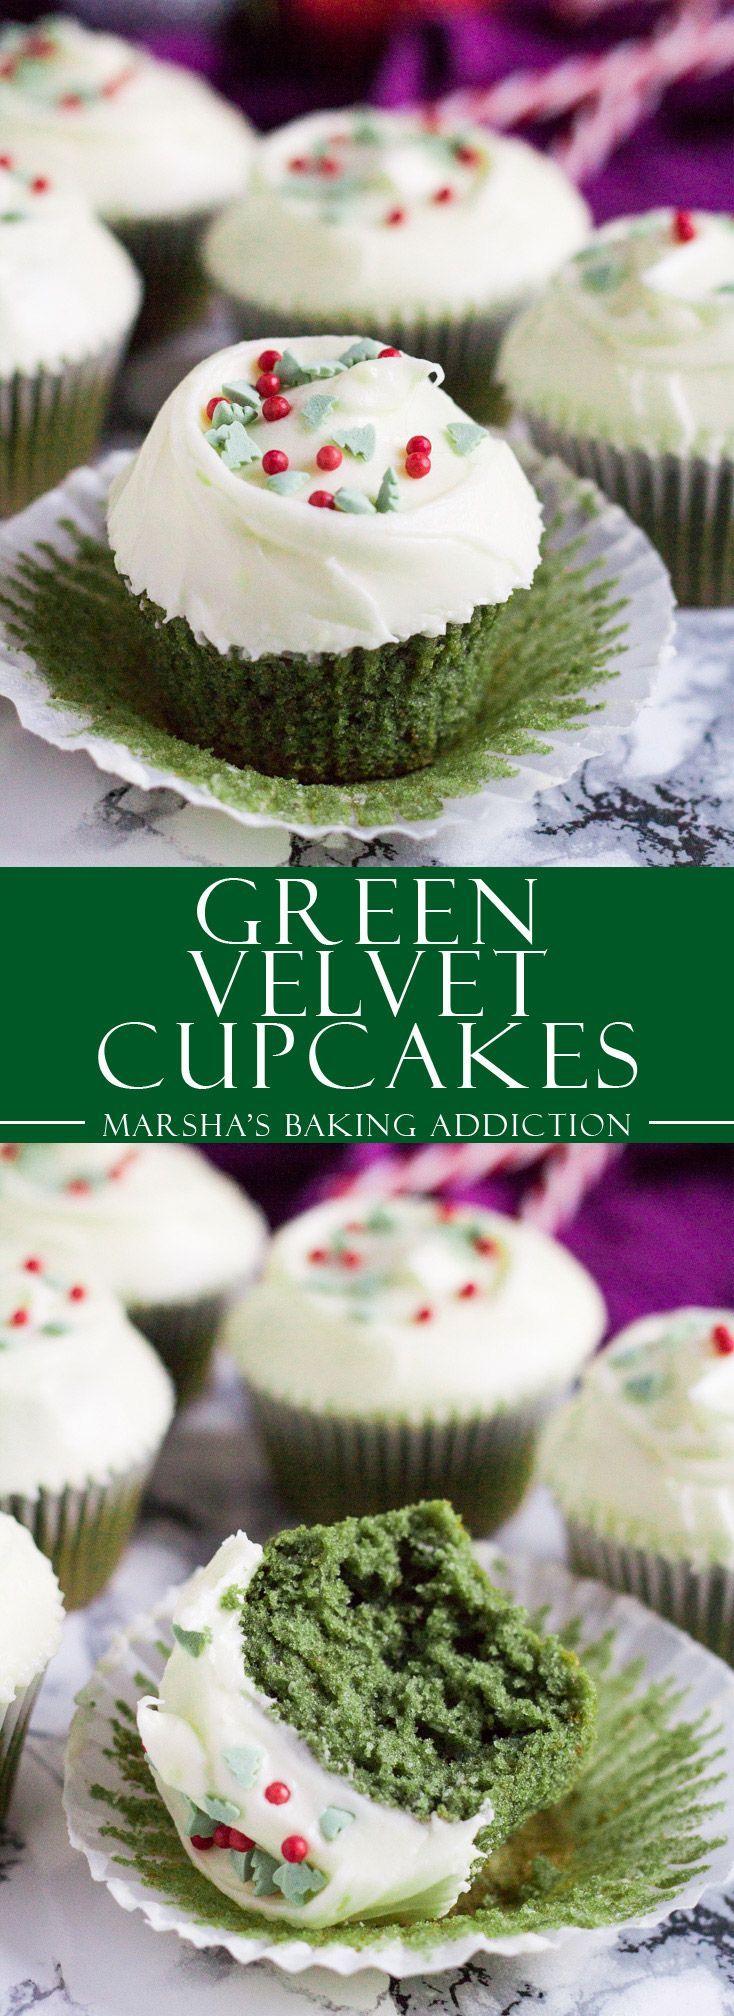 Green Velvet Cupcakes | http://marshasbakingaddiction.com /marshasbakeblog/